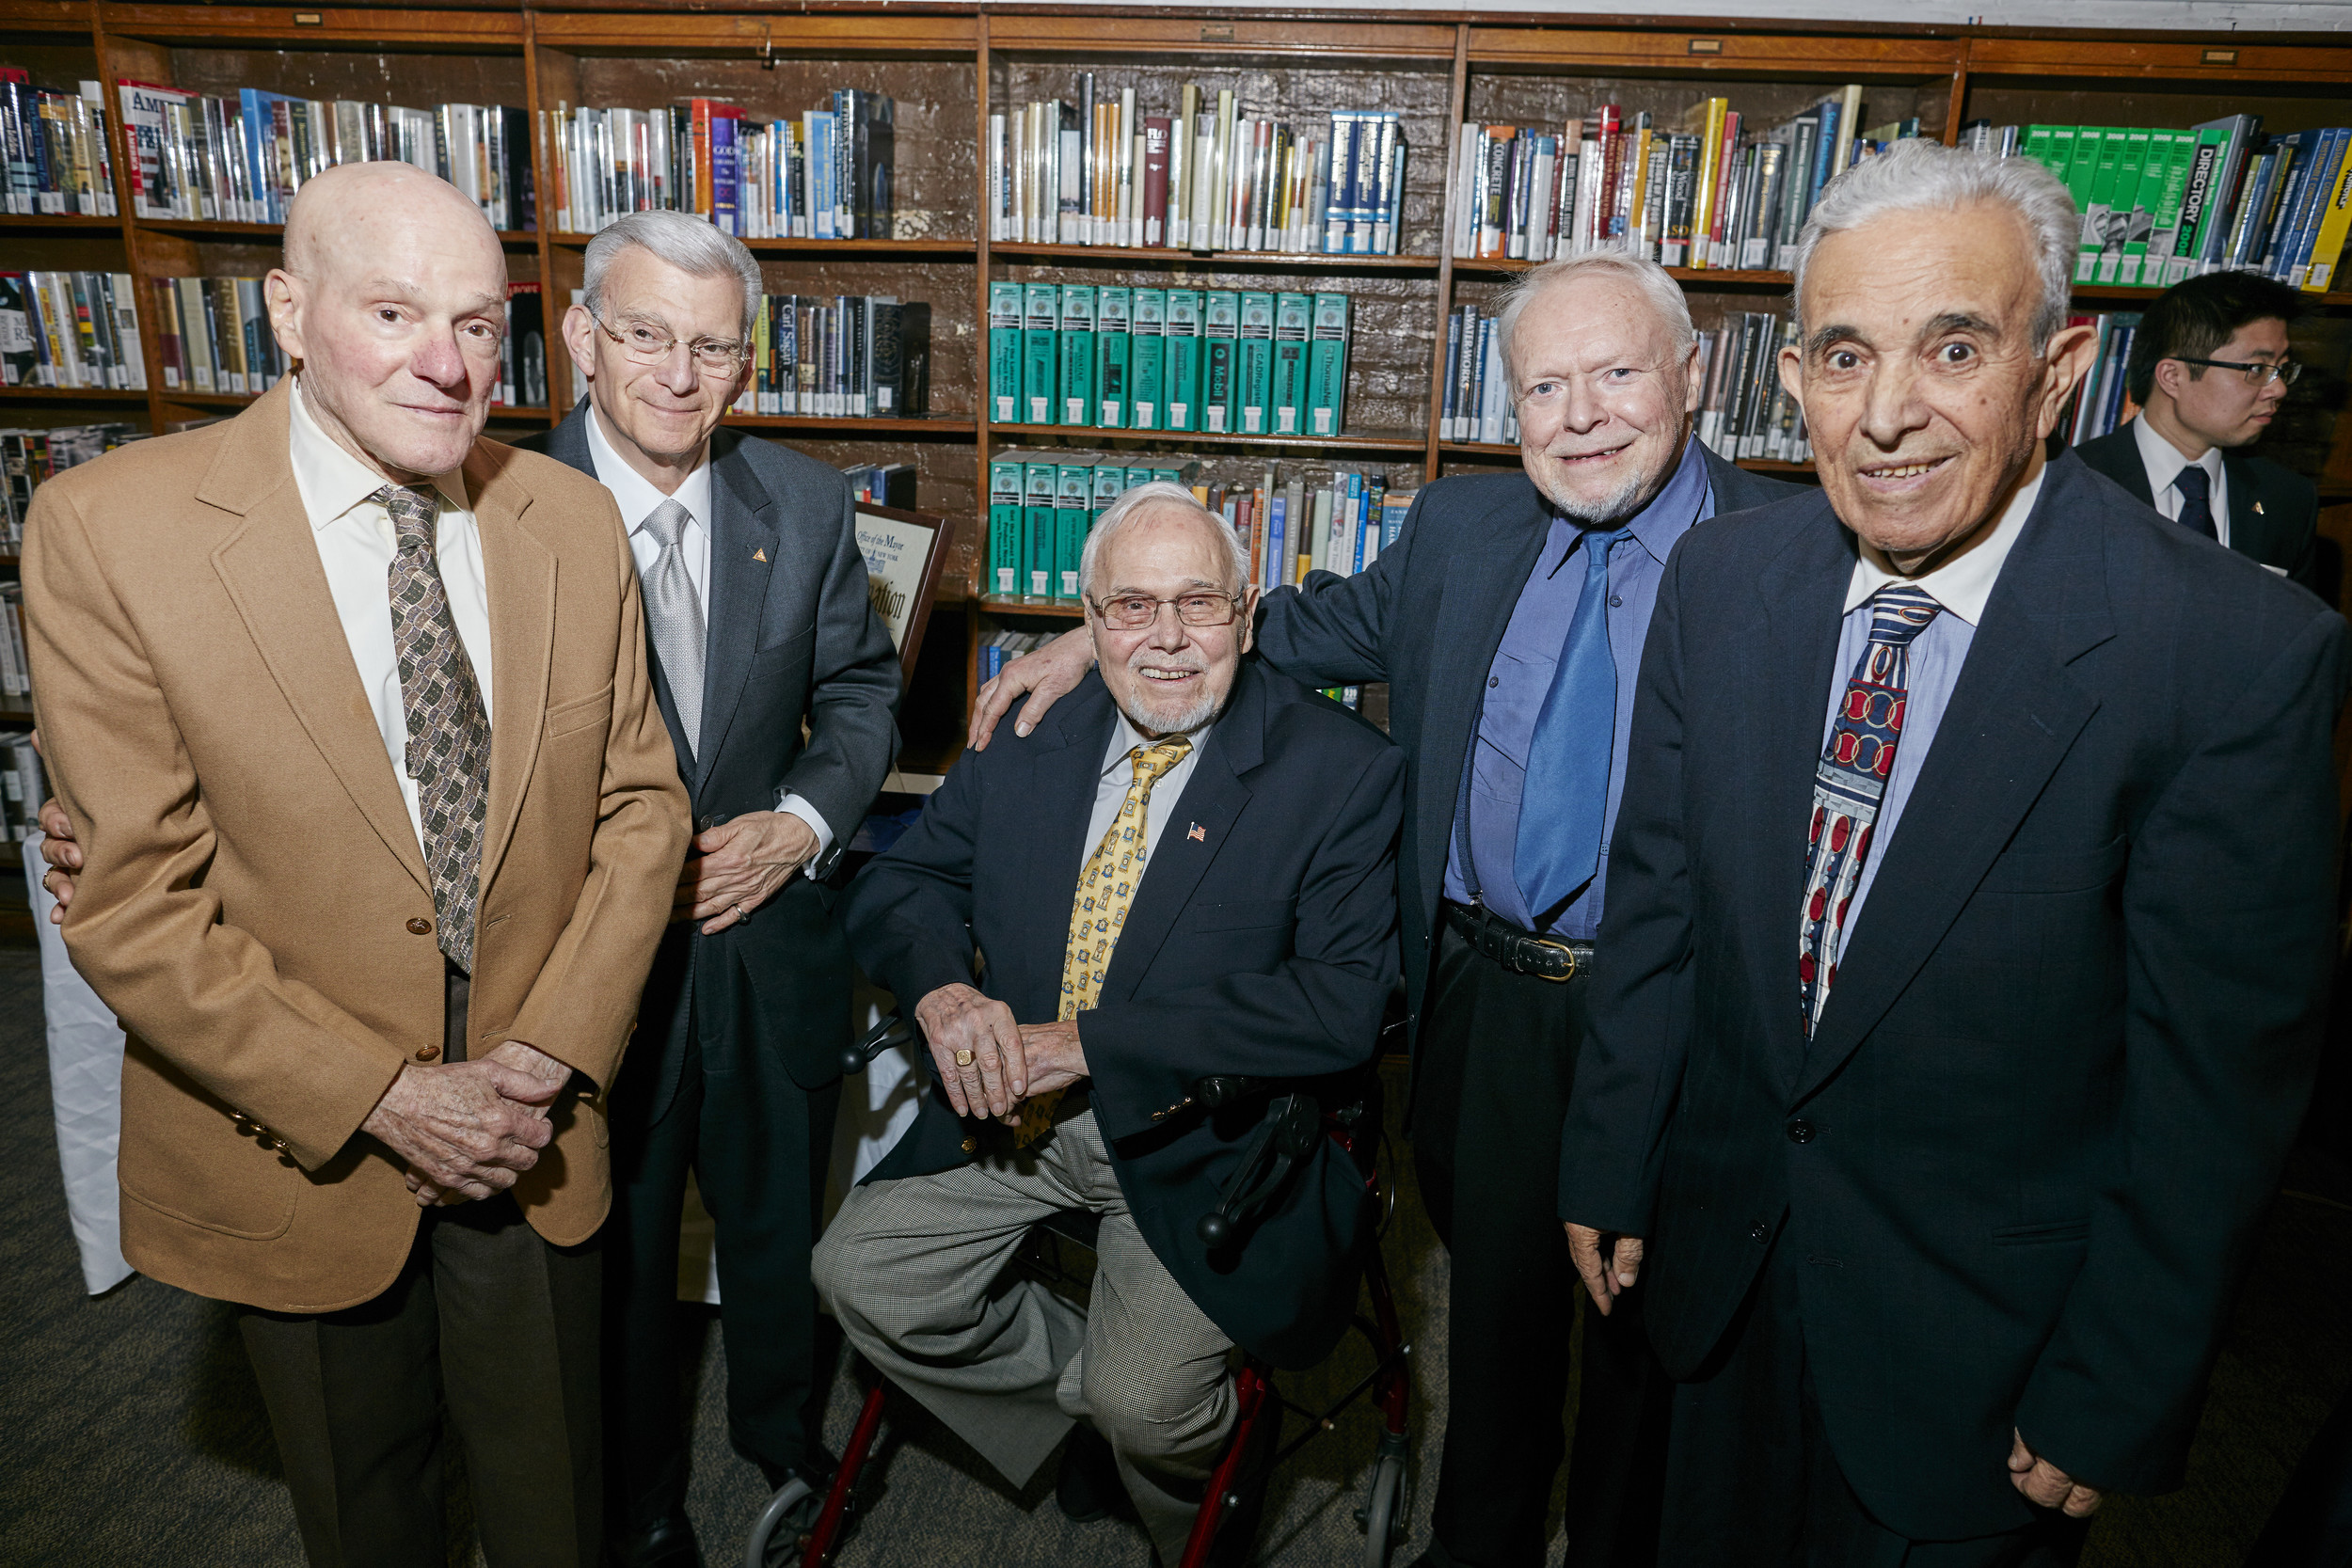 HSNY Fellows, left to right: Joe Poloso, Charles Salomon, Hans Weber, Walter Pangretitsch, Arsen Manoukian